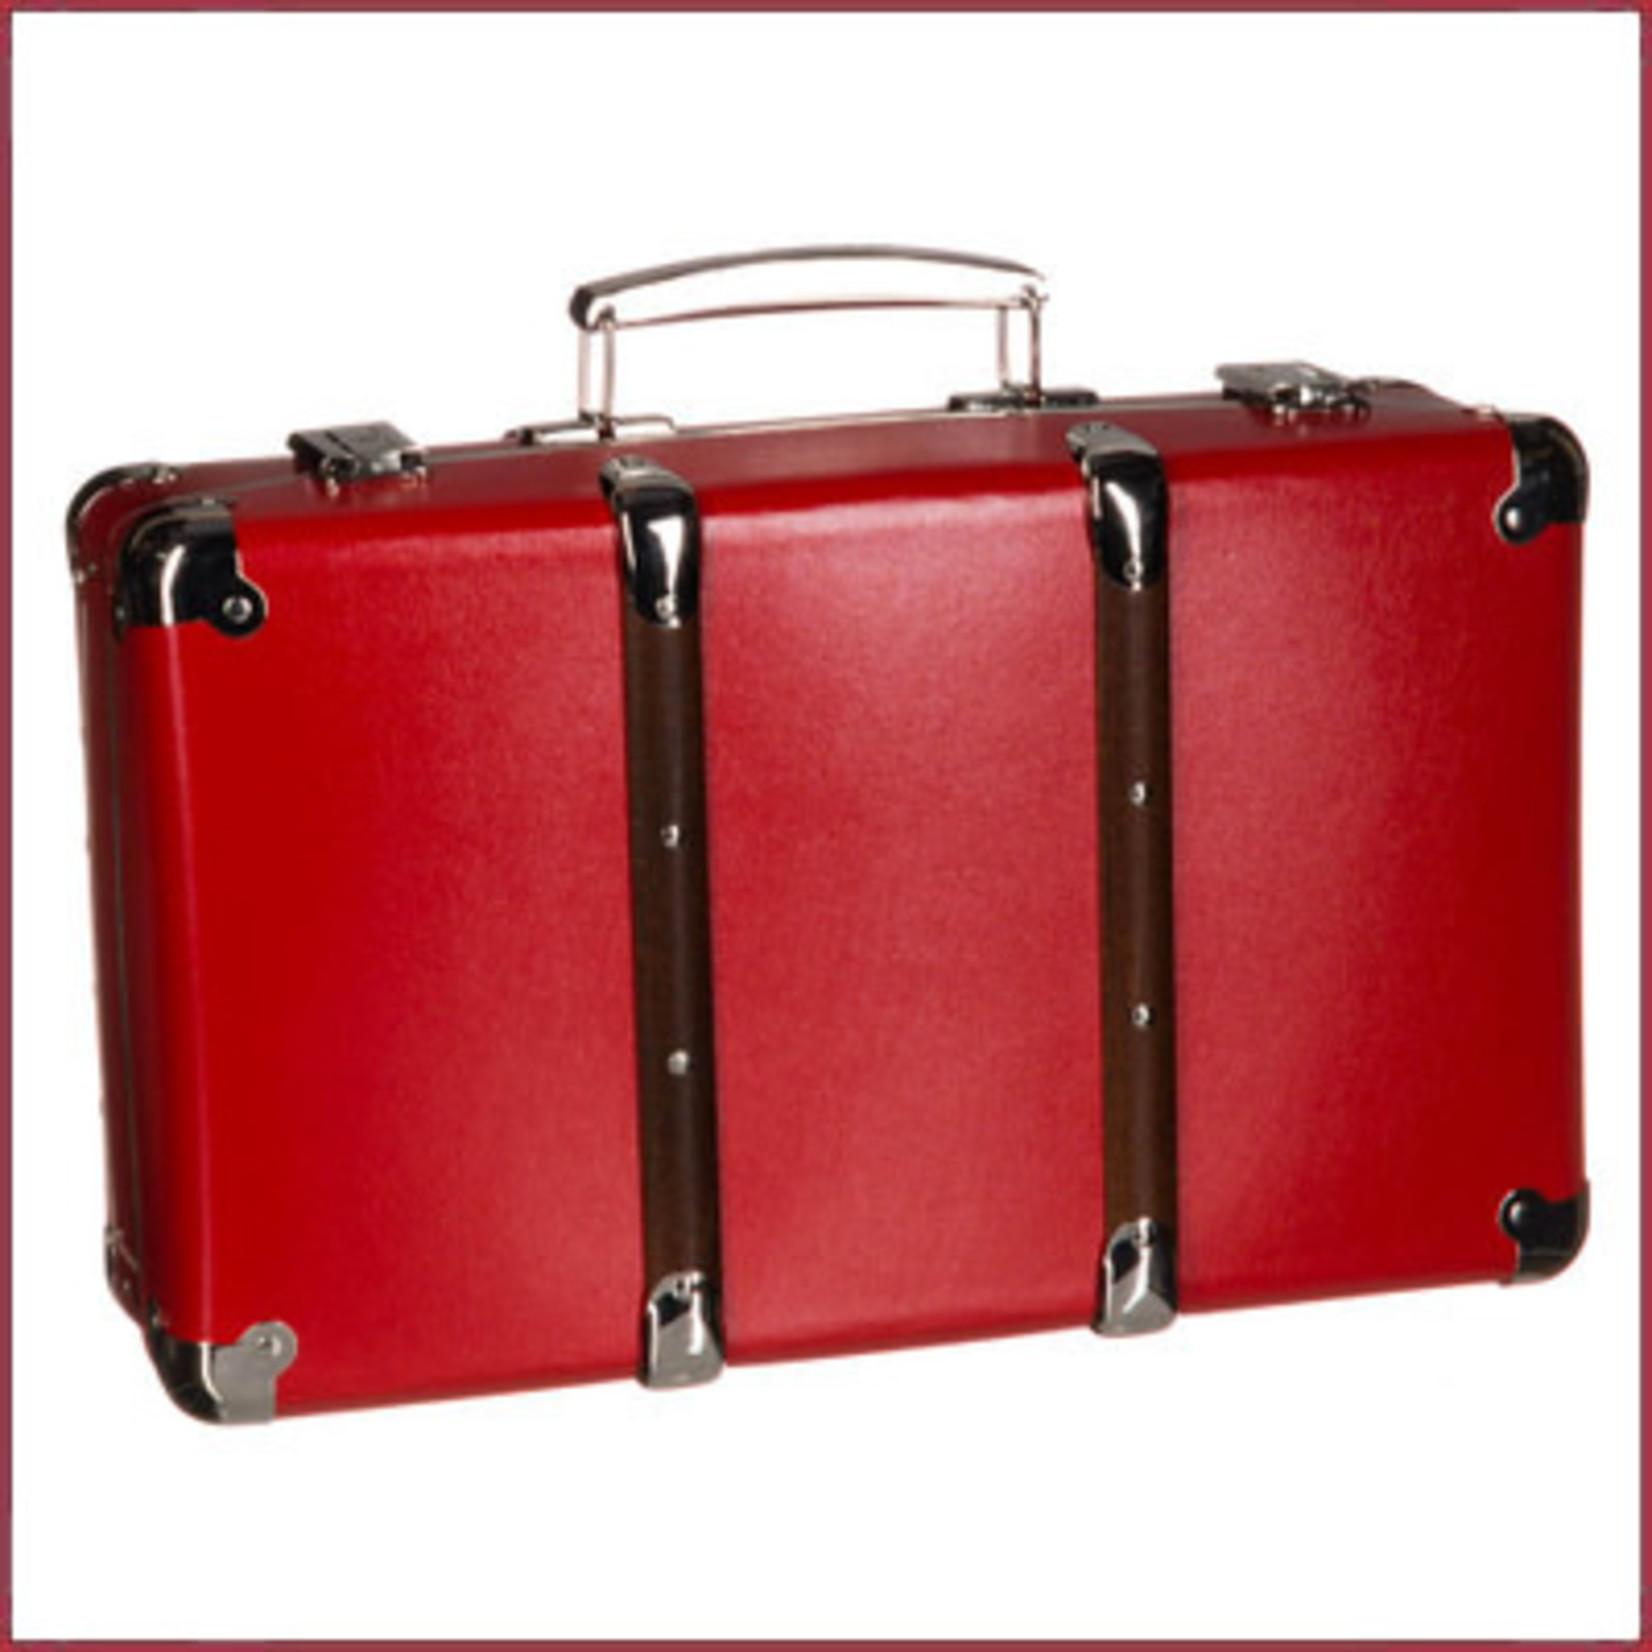 Attaché koffer rood, met bruine houten latten 40cm